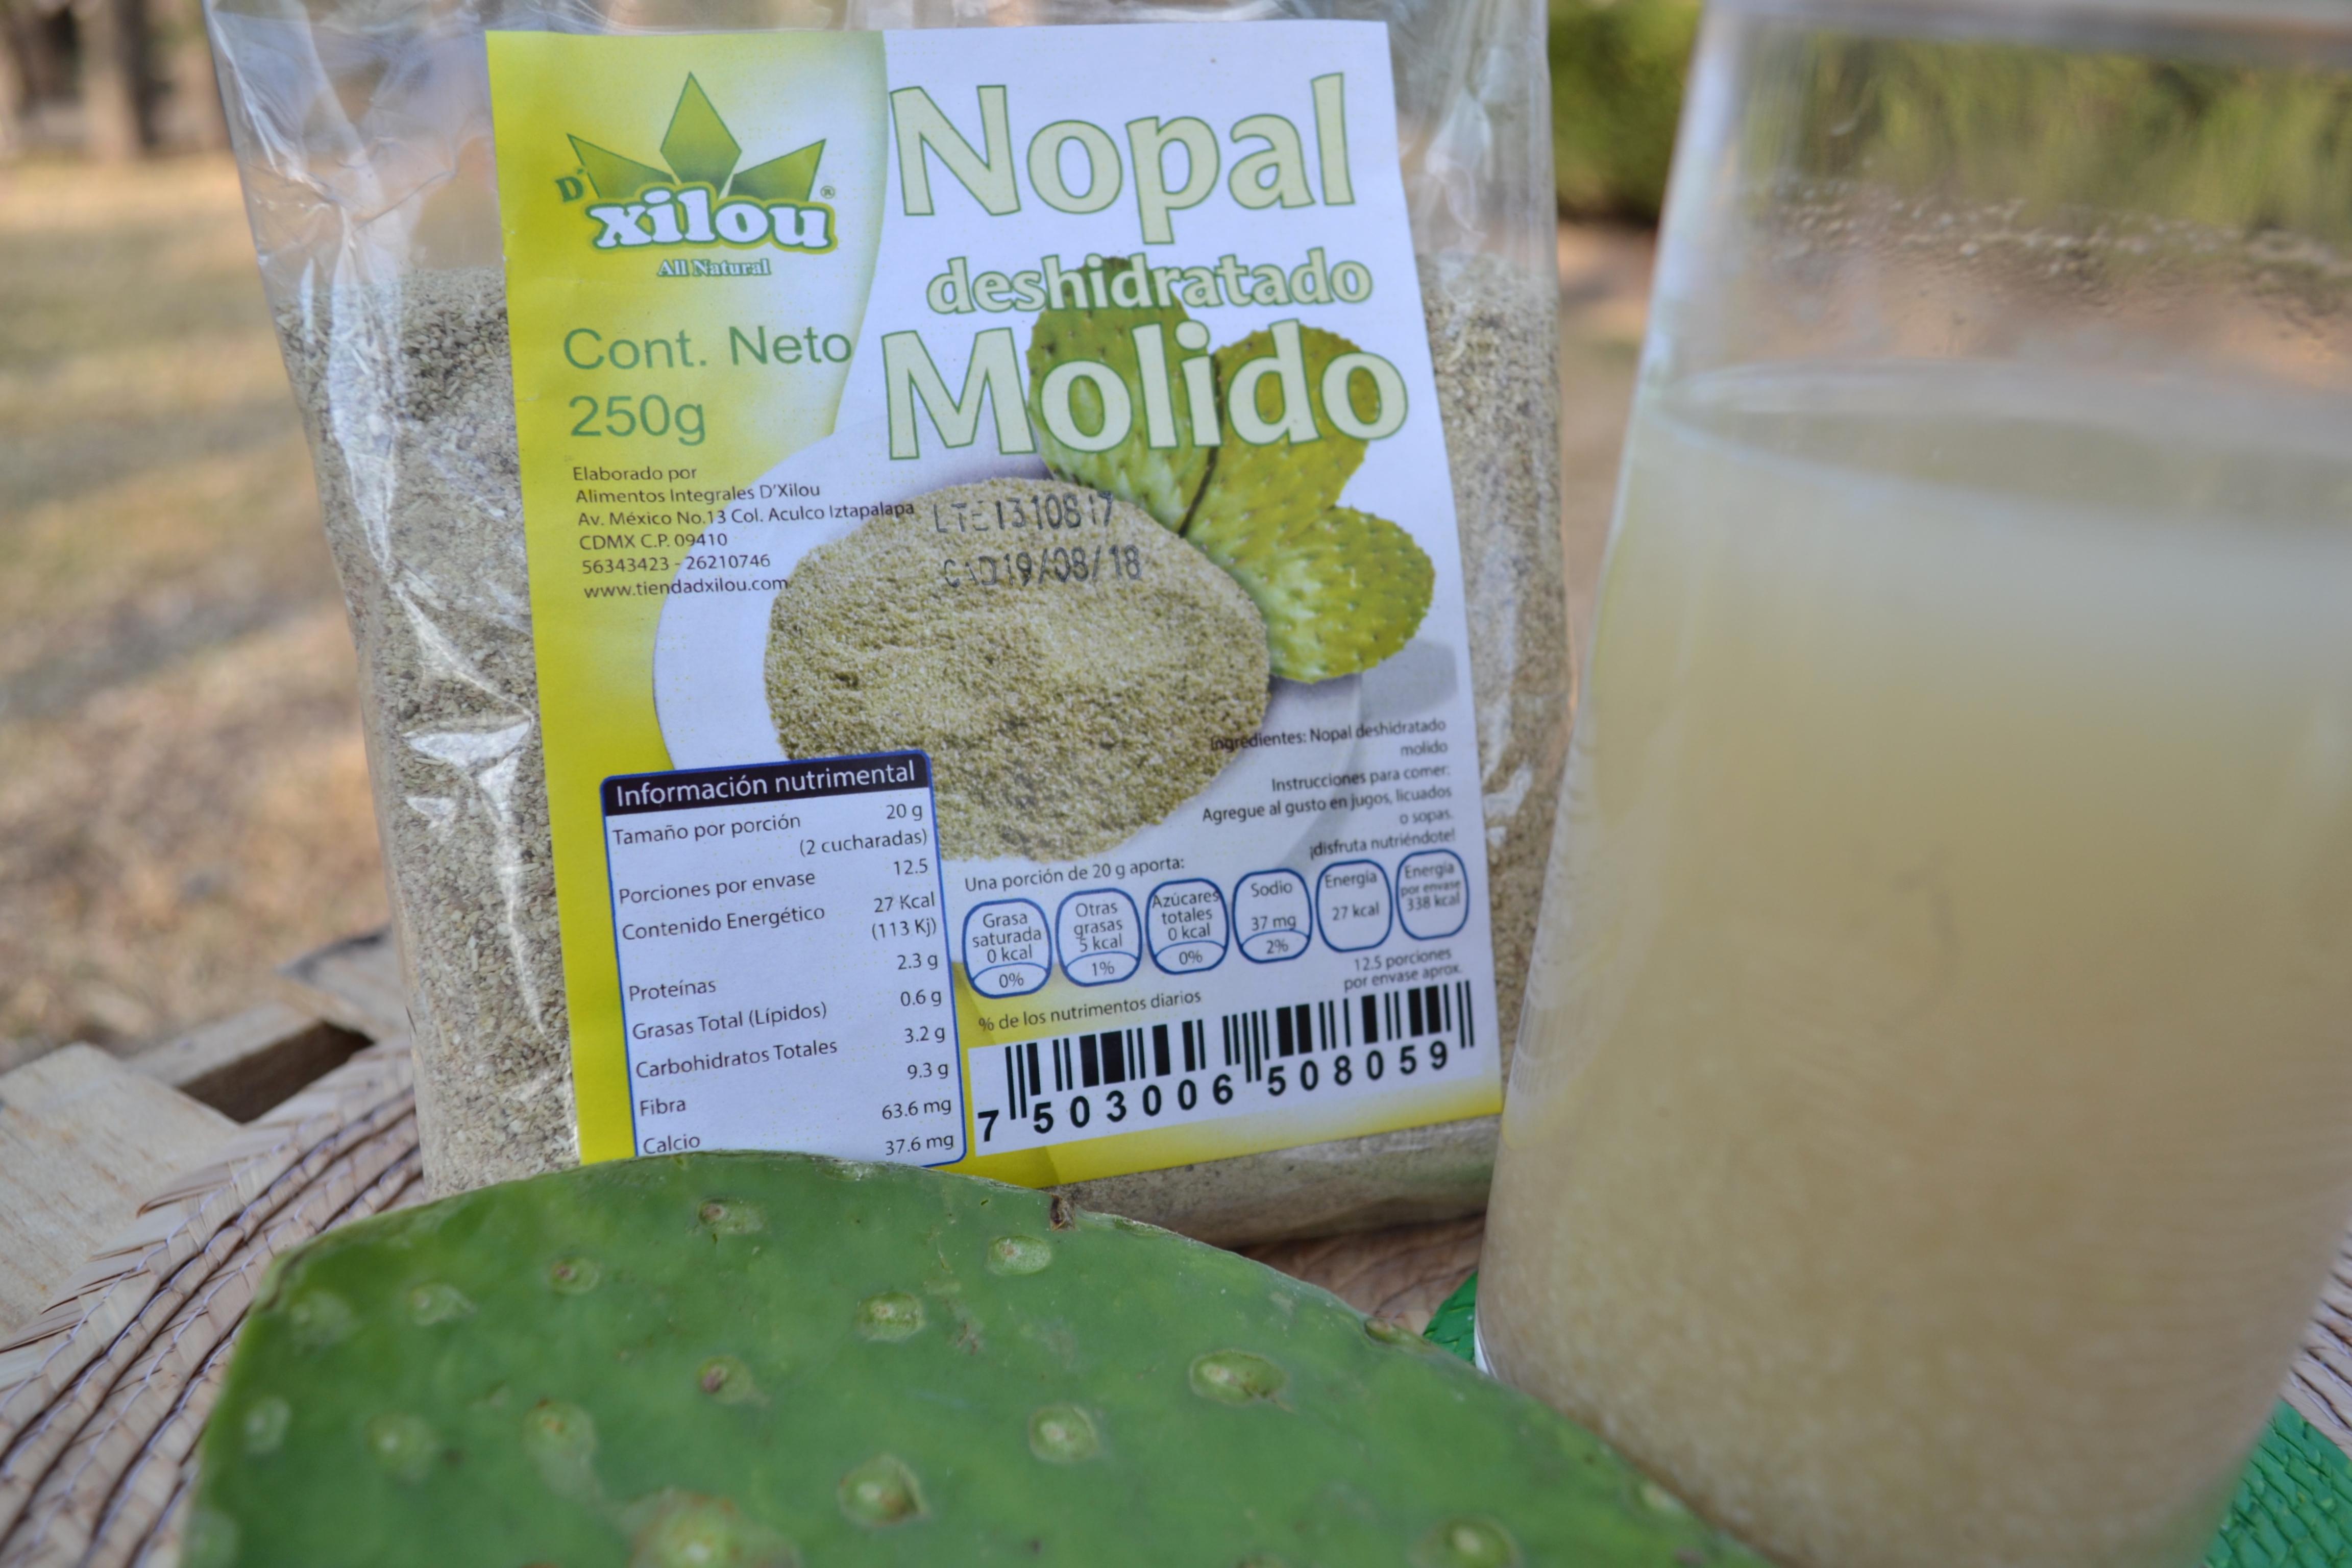 Nopal Deshidratado Molido 250g.